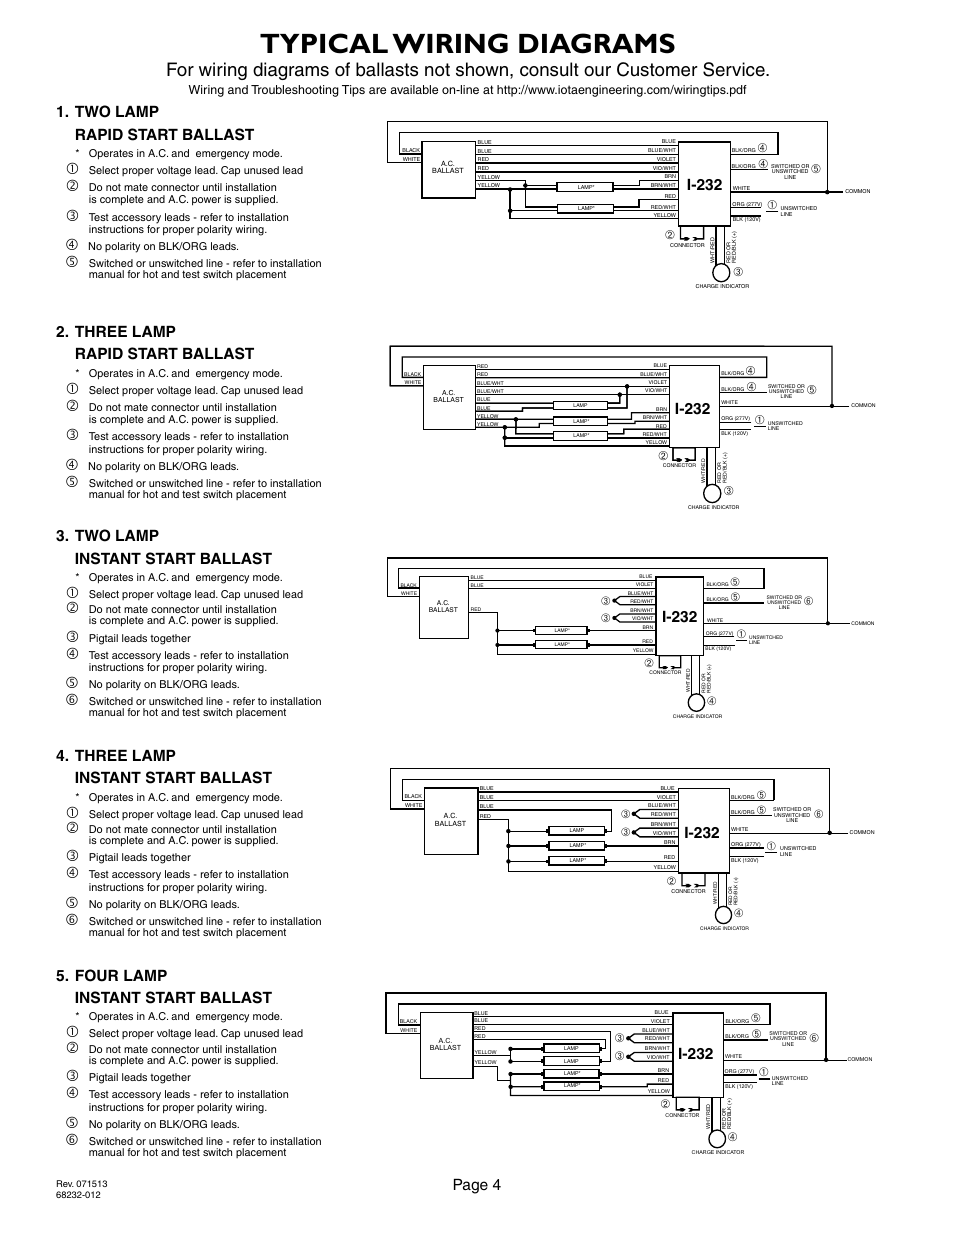 iota i 232 page4?resize=665%2C861 iota i 320 wiring diagram lighting diagrams, pinout diagrams iota i 320 wiring diagram at n-0.co